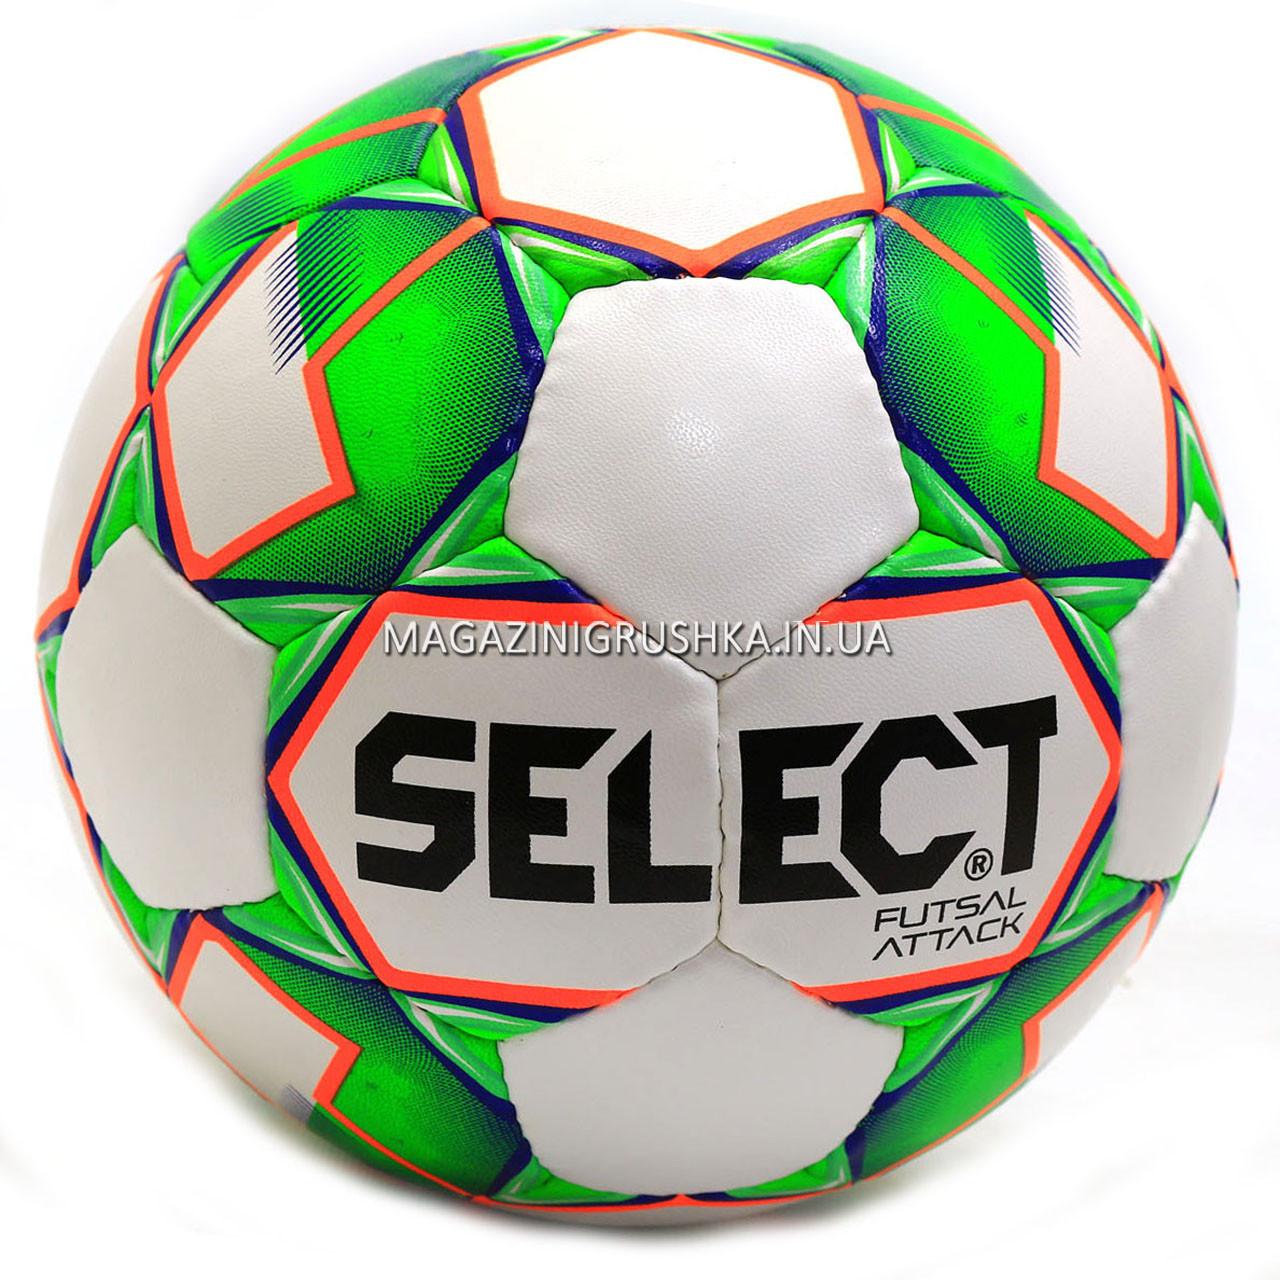 Мяч футзальный SELECT Futsal Attack Grain - 4